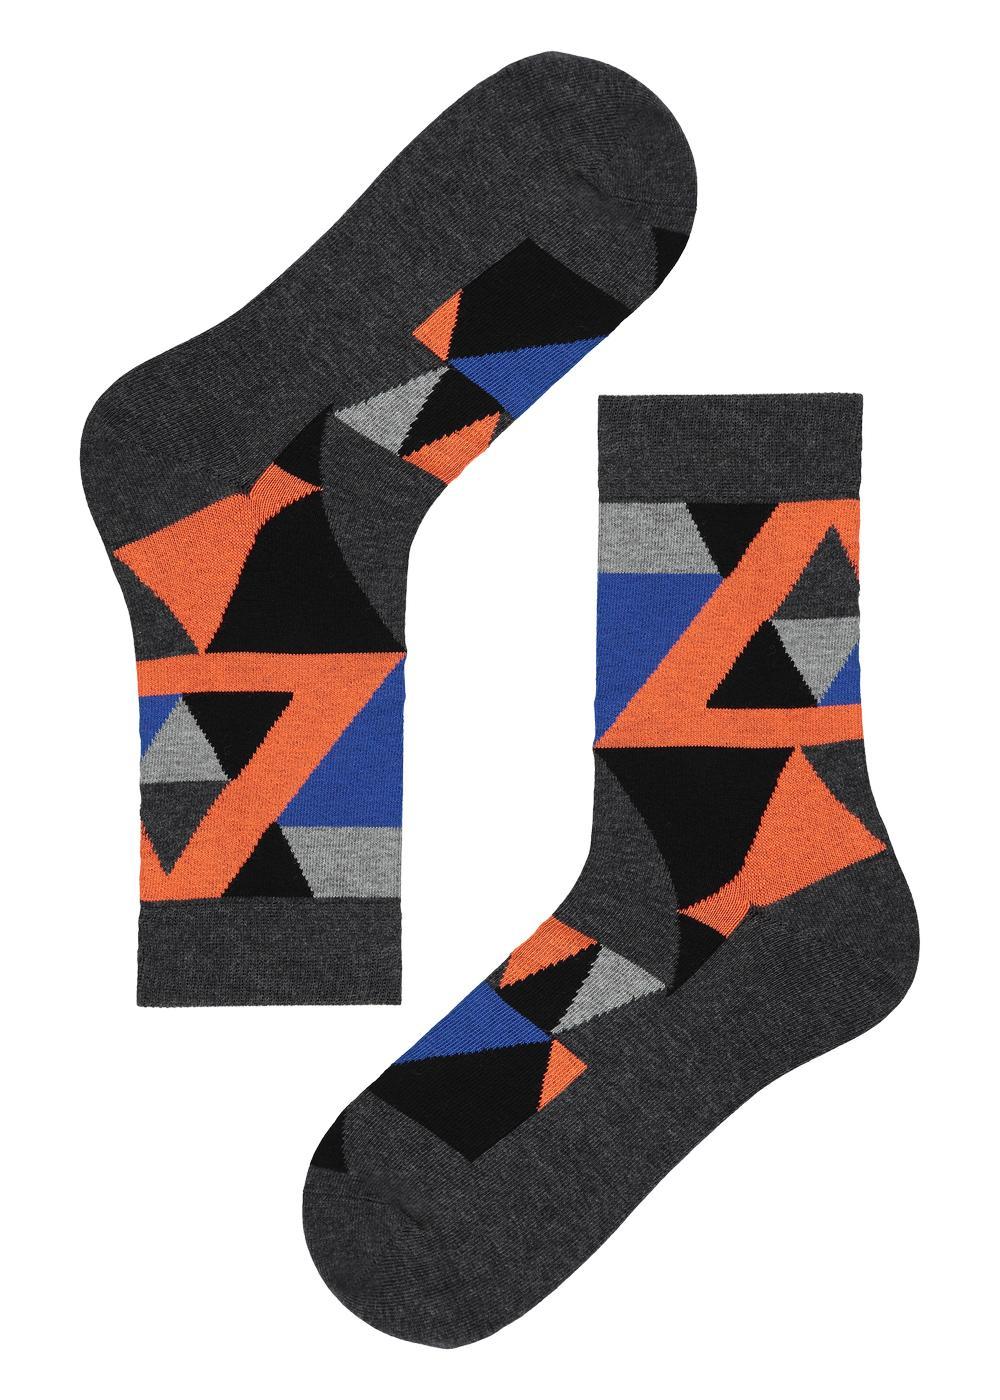 Men's Patterned Cotton Short Socks